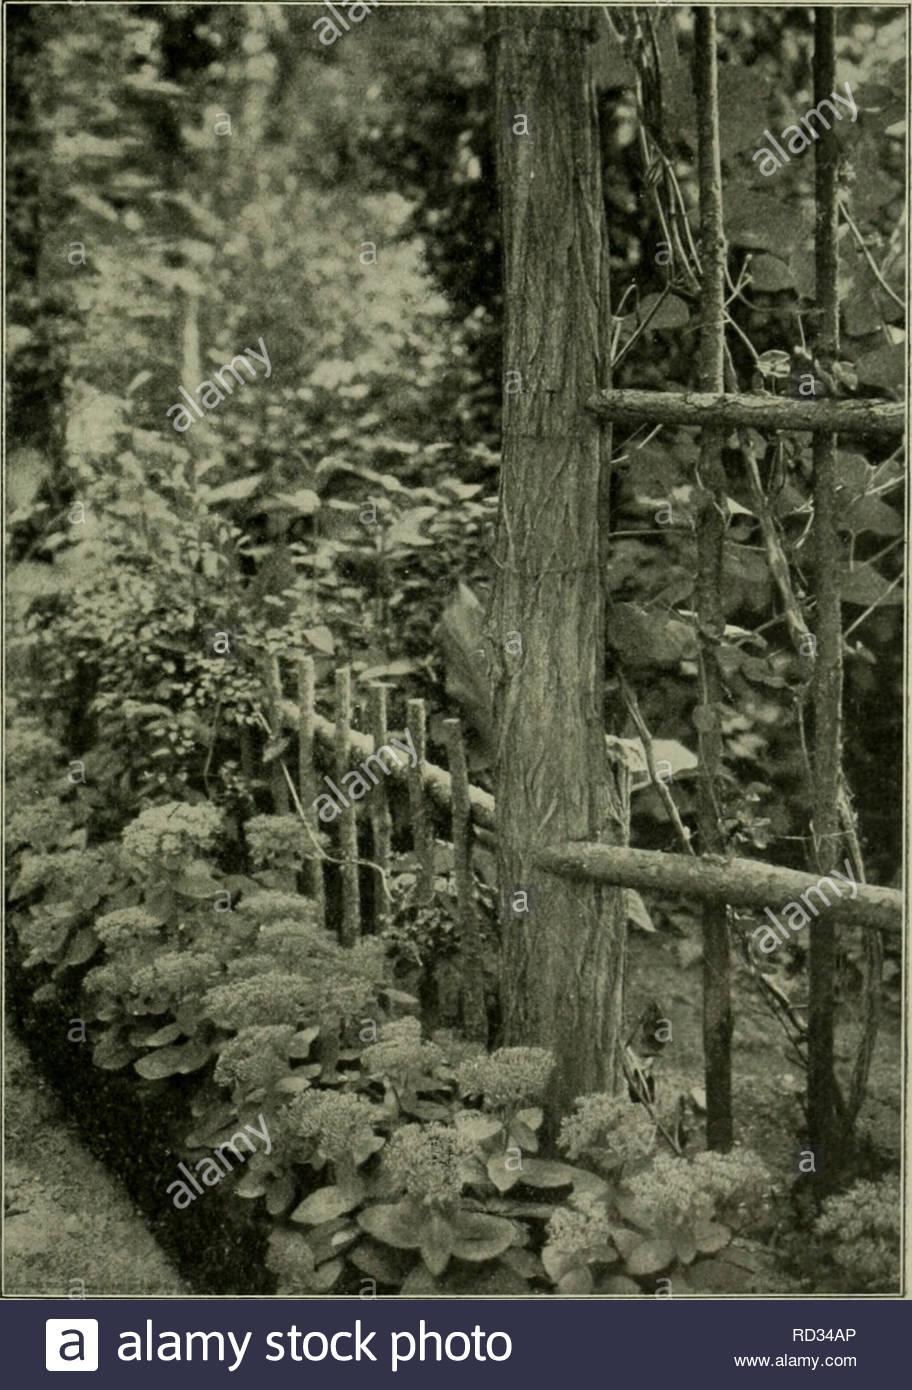 Steinfiguren Für Den Garten Selber Machen Neu –¡ Pflanze Stock S & –¡ Pflanze Stock Page 2